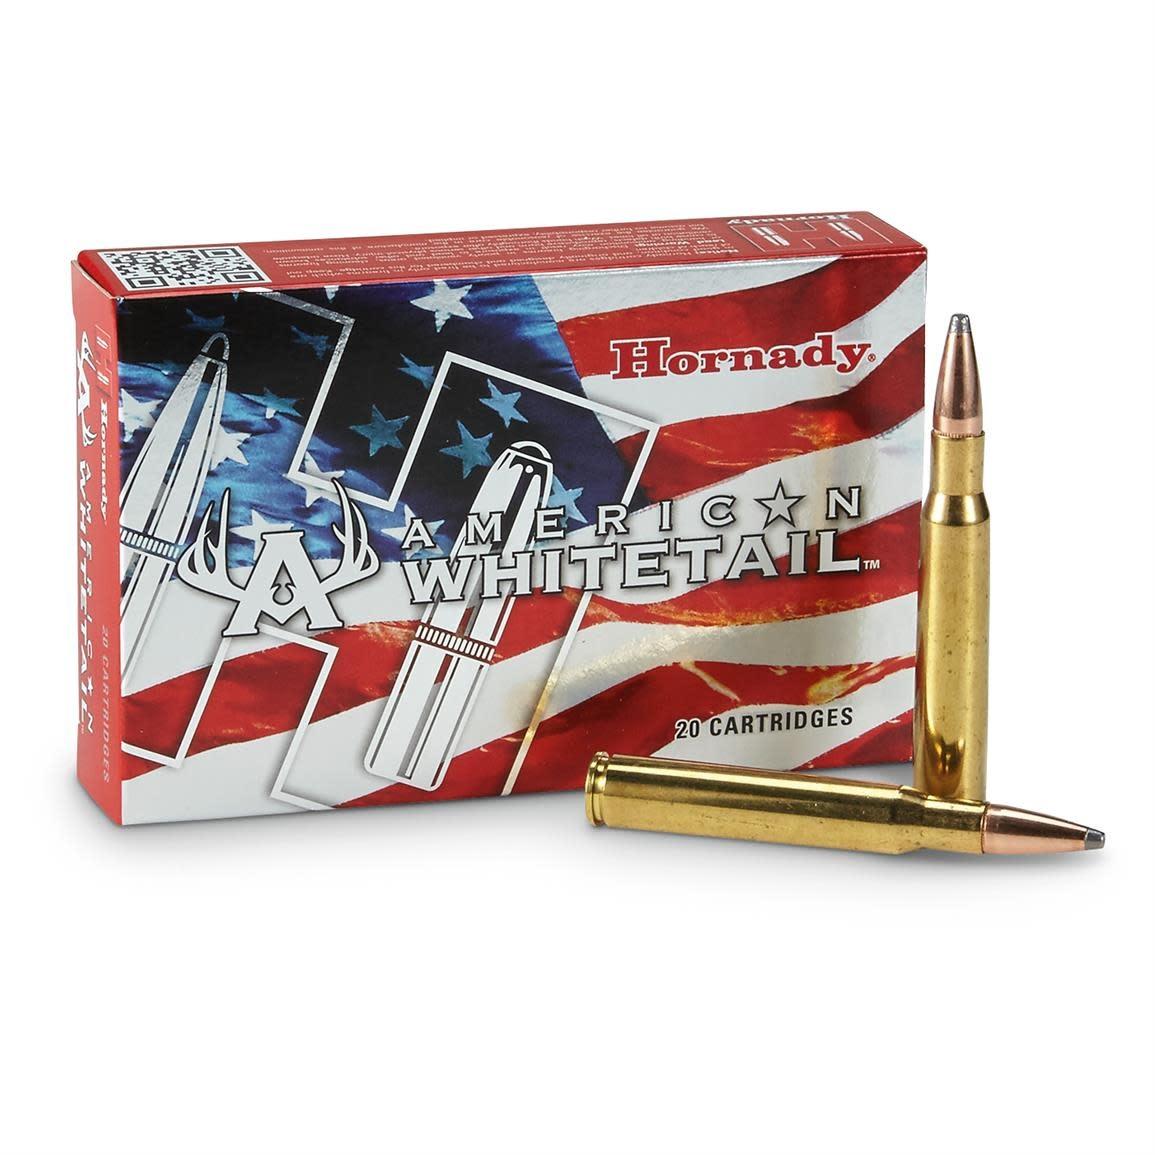 Hornady American Whitetail 300 Win Mag, 150 gr Interlock SP (20 Pk)